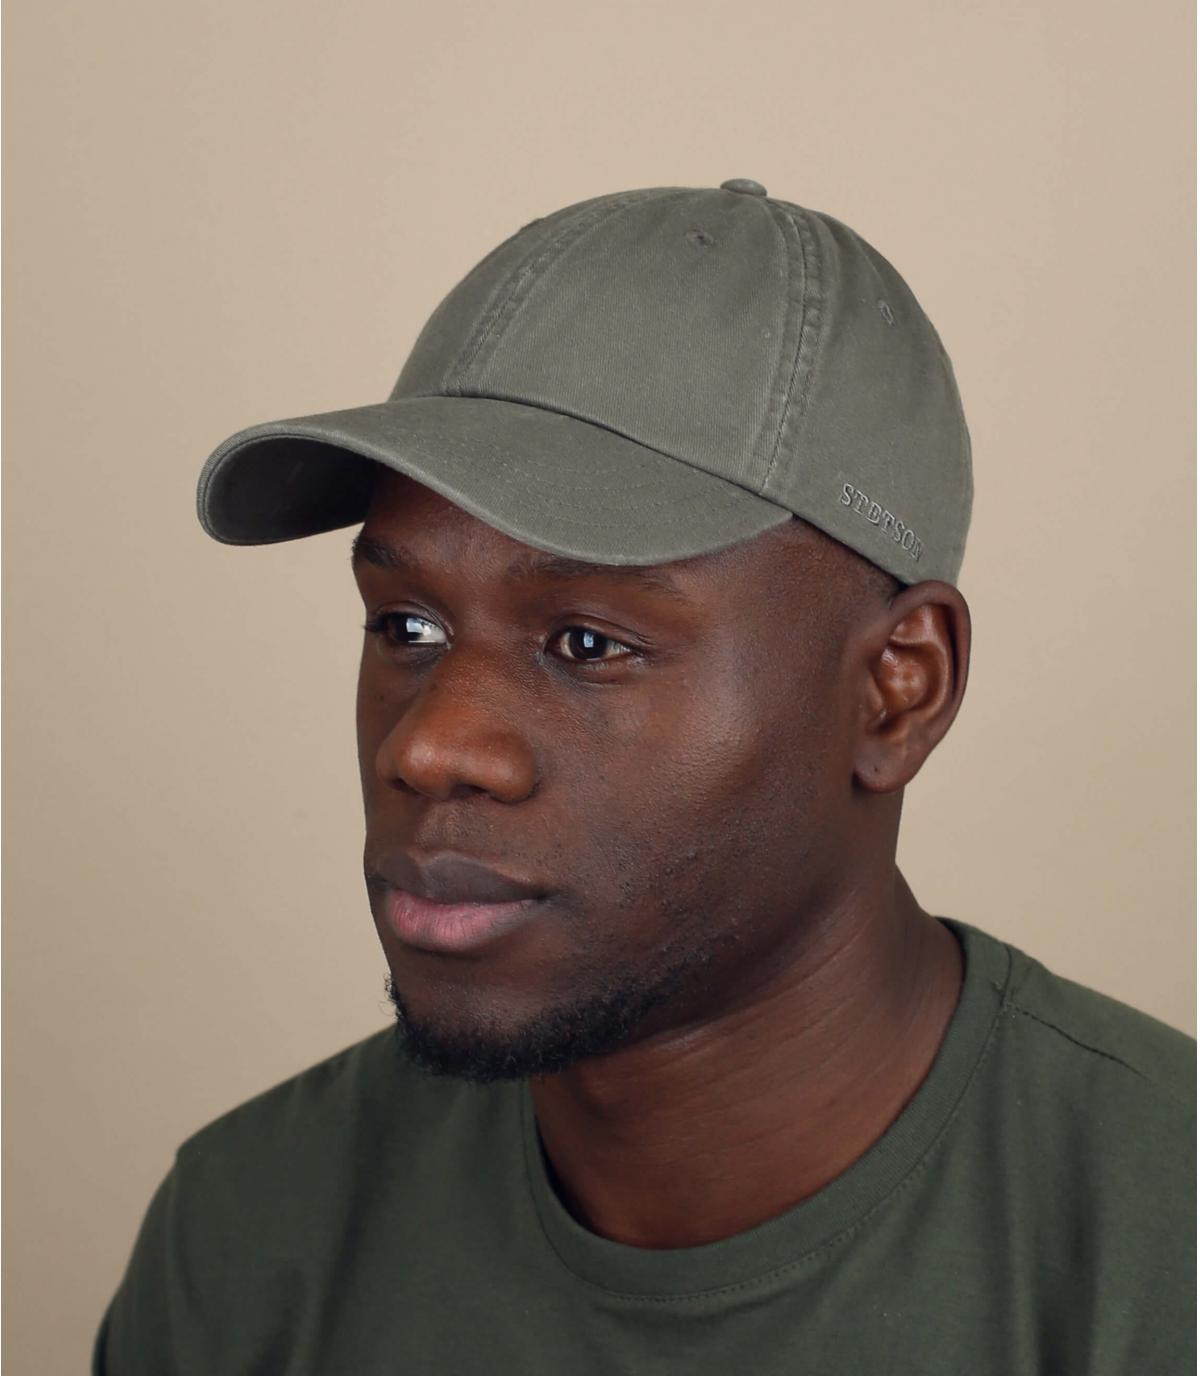 cappellino Stetson verde